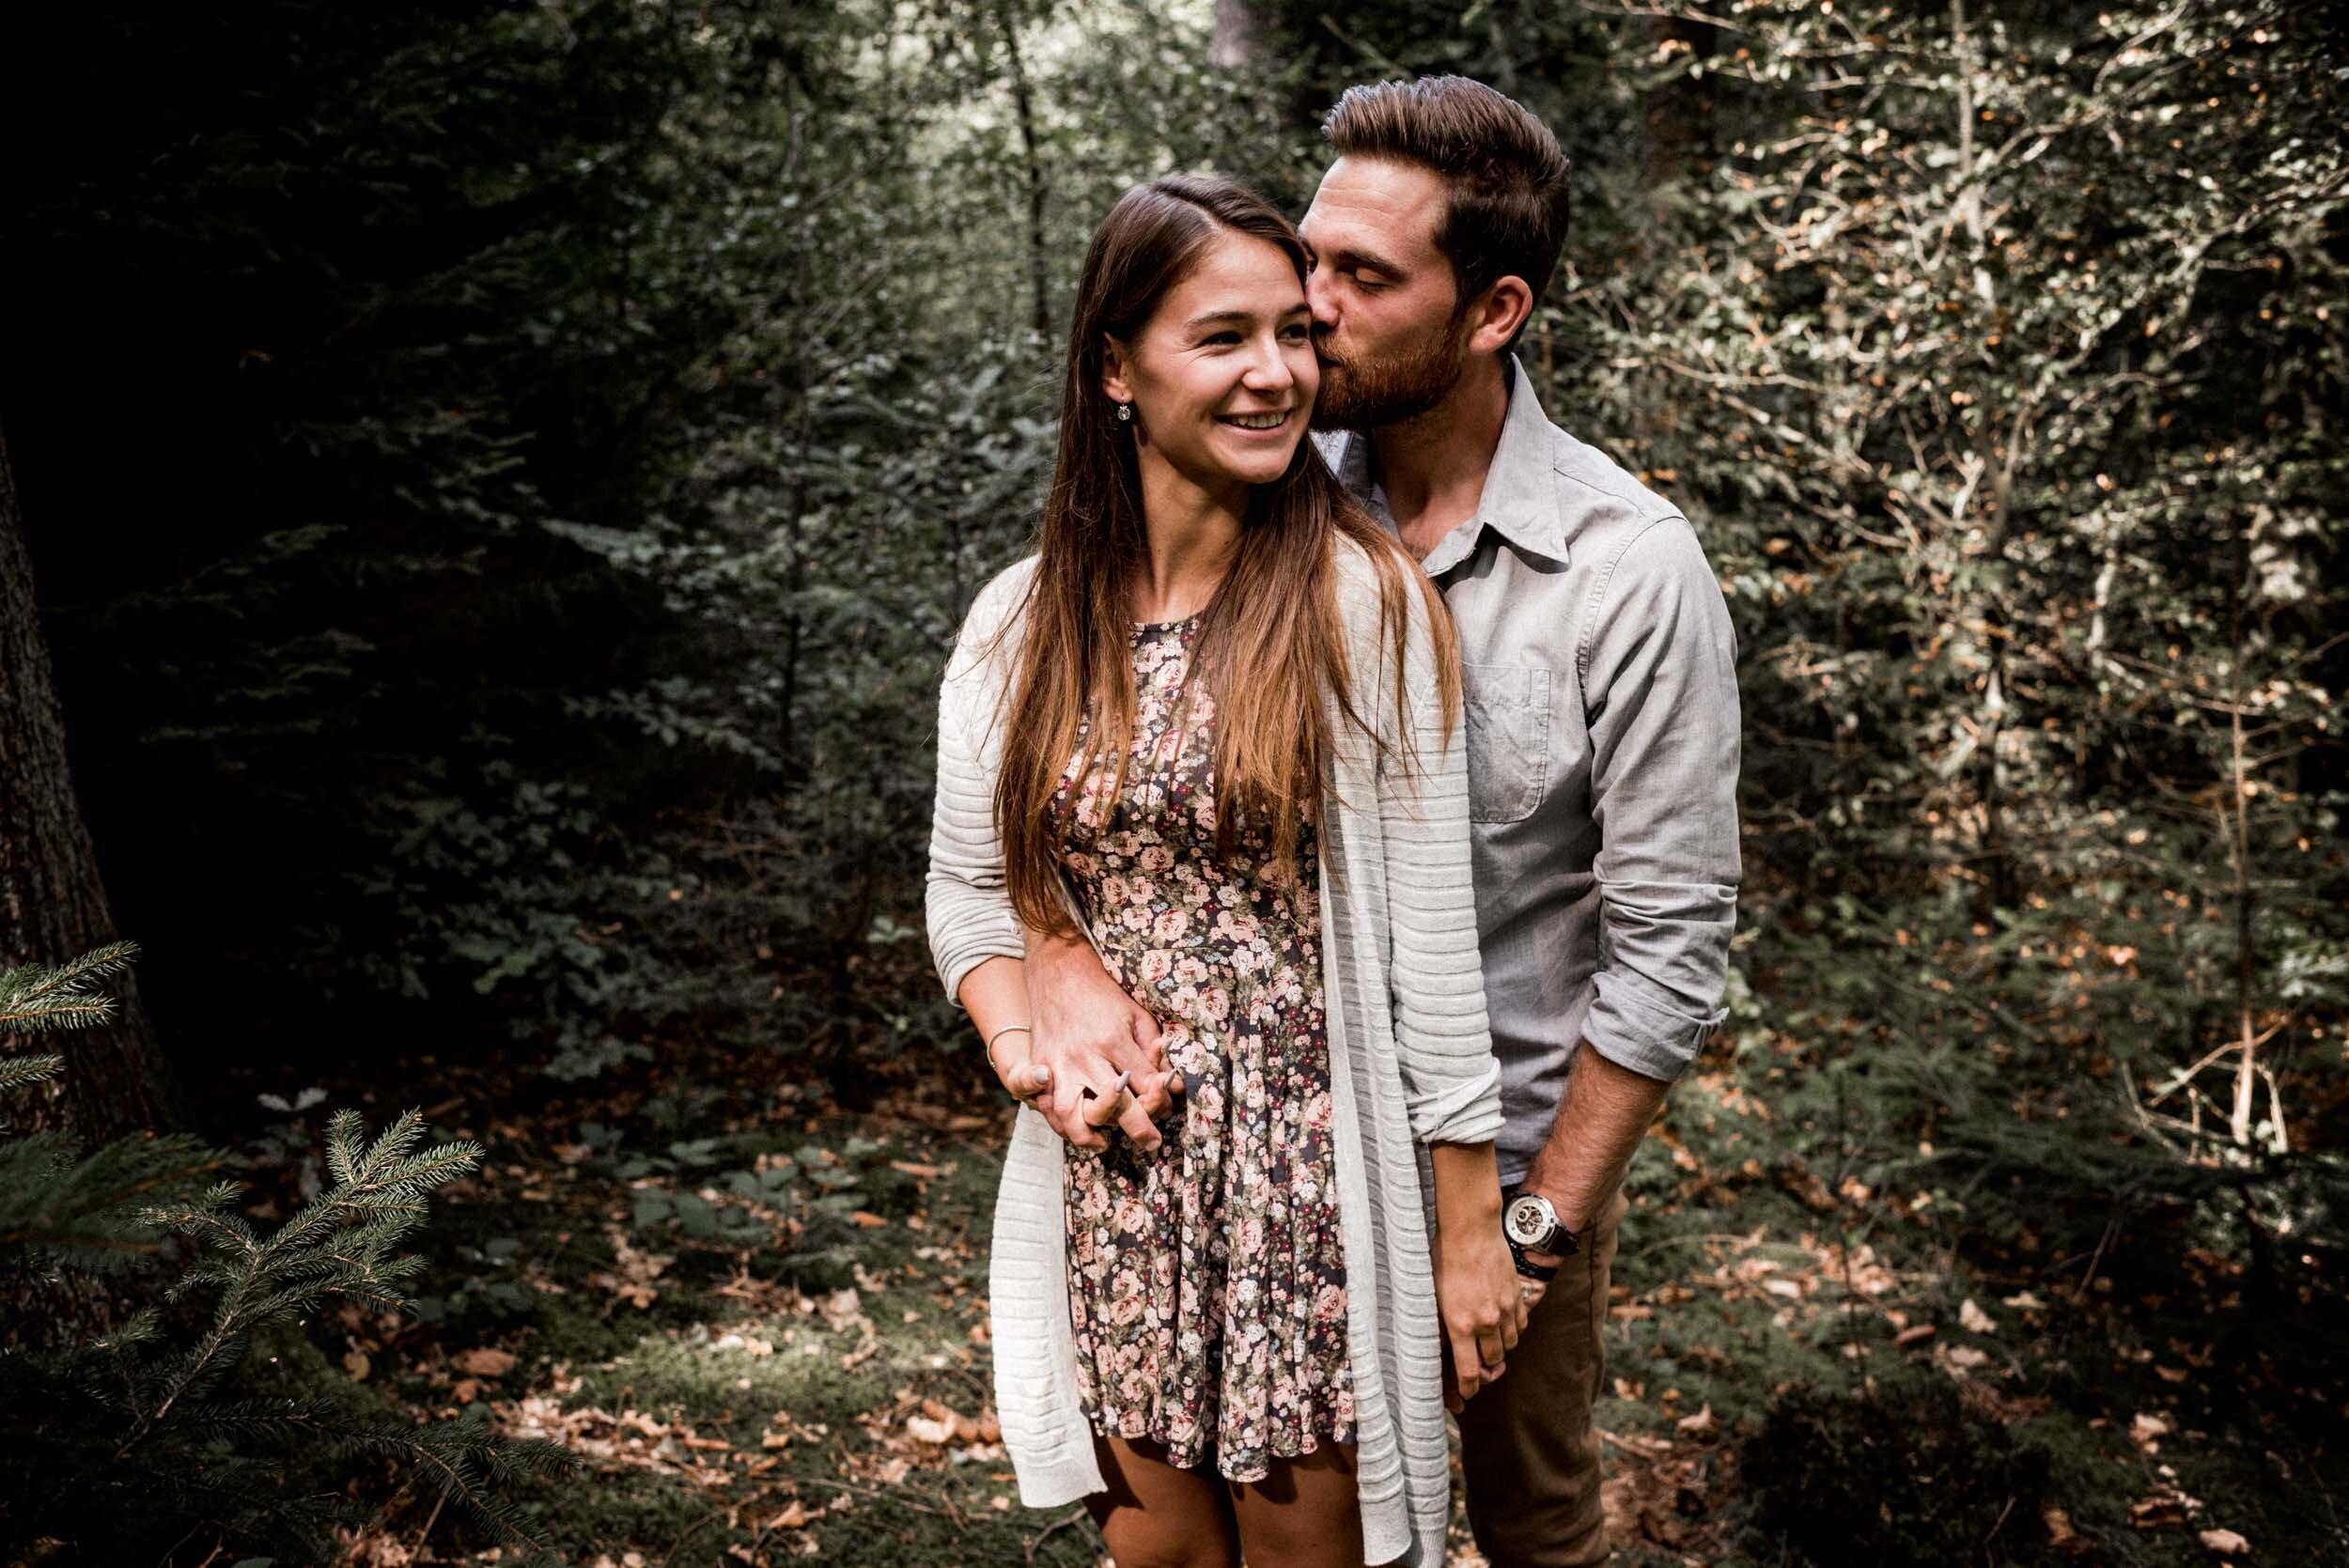 Couple-Shooting_2019_2.jpg